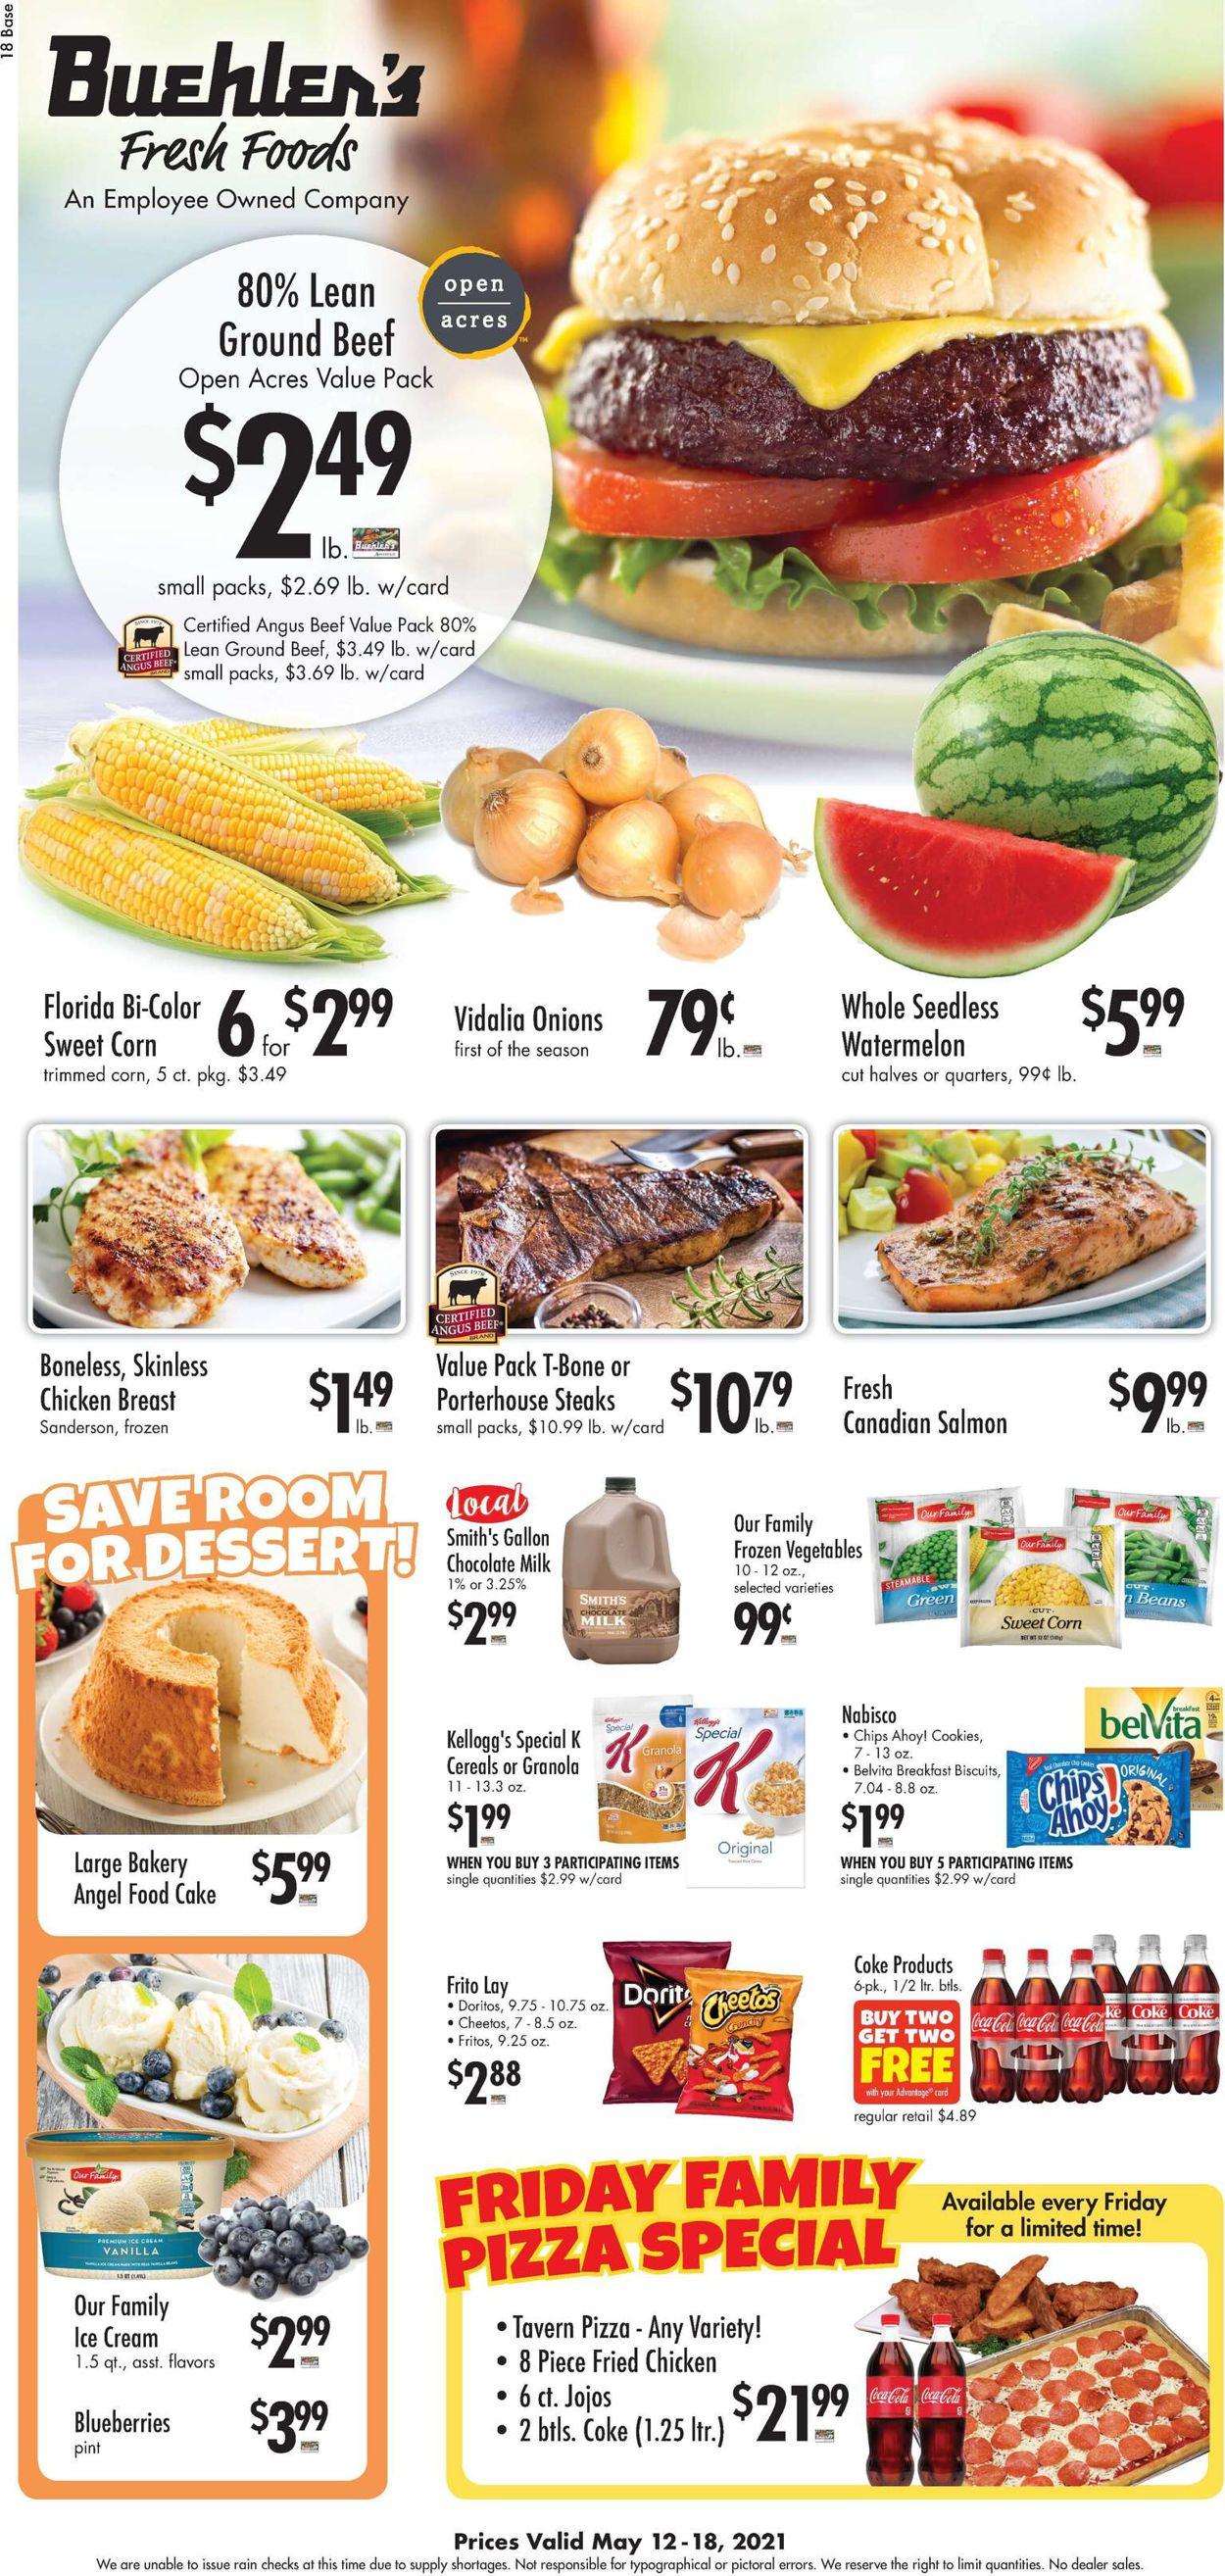 Buehler's Fresh Foods Weekly Ad Circular - valid 05/12-05/18/2021